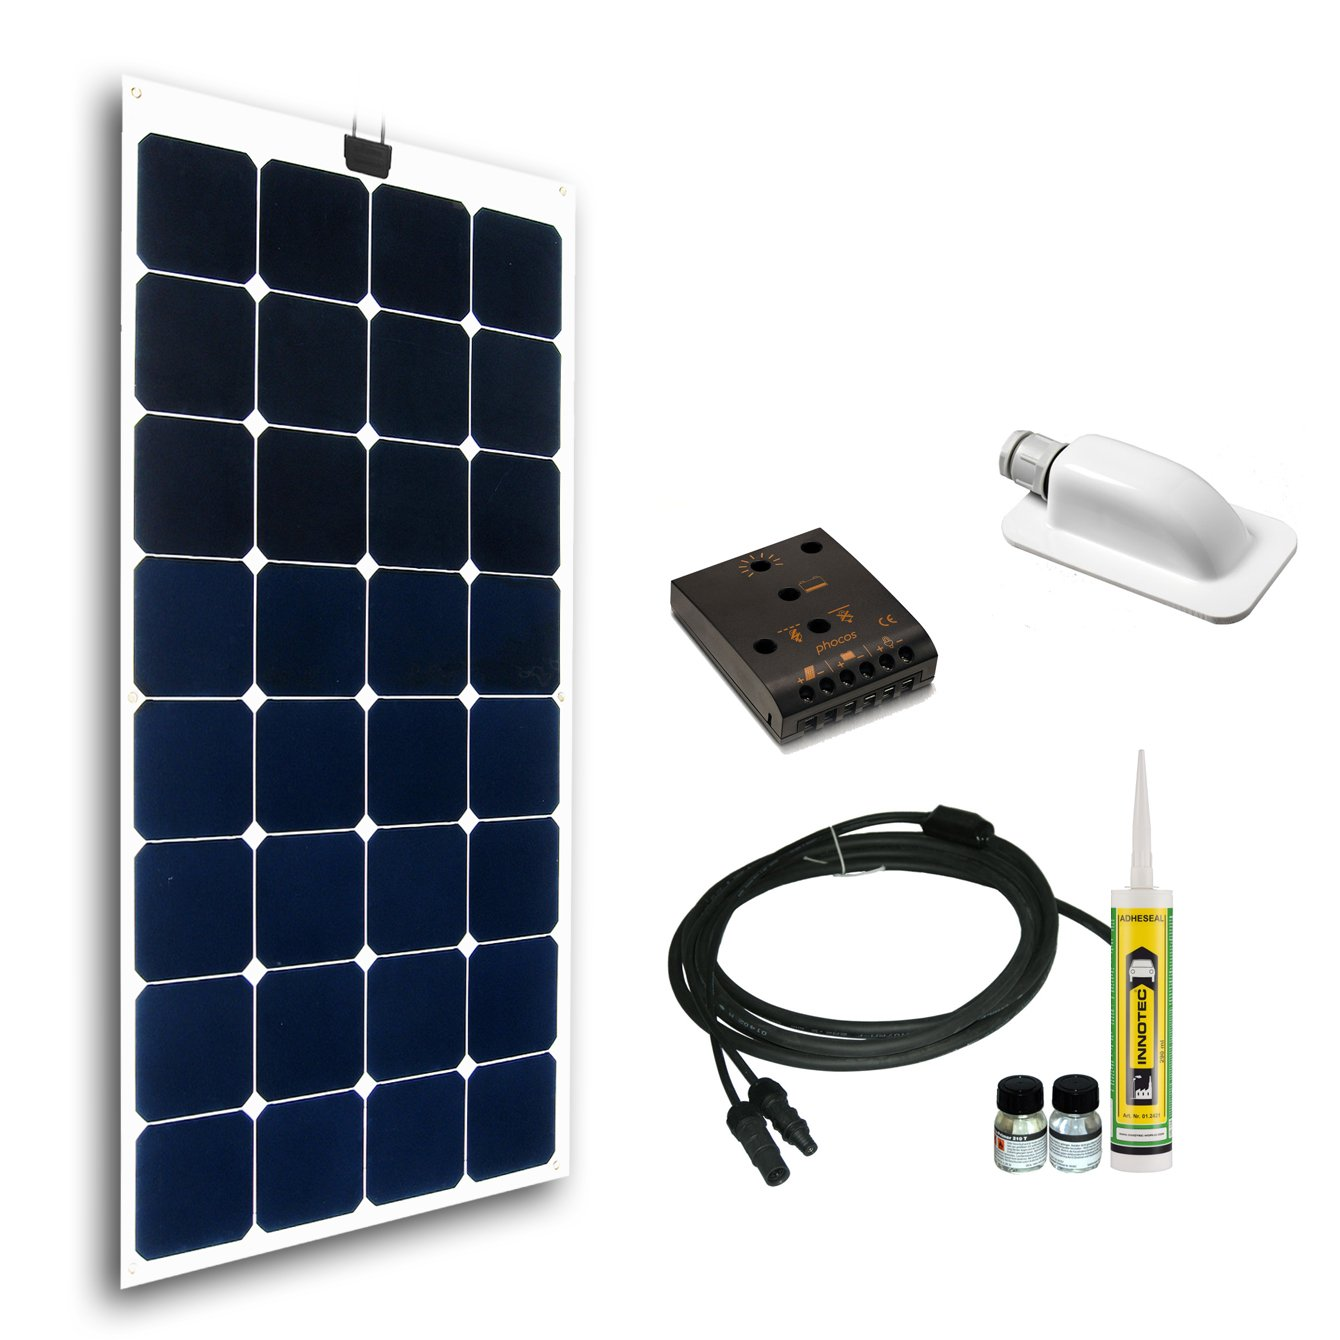 Cleversolar 119233KPS Flexible Monokristalline Solarmodul Kit, 100 W